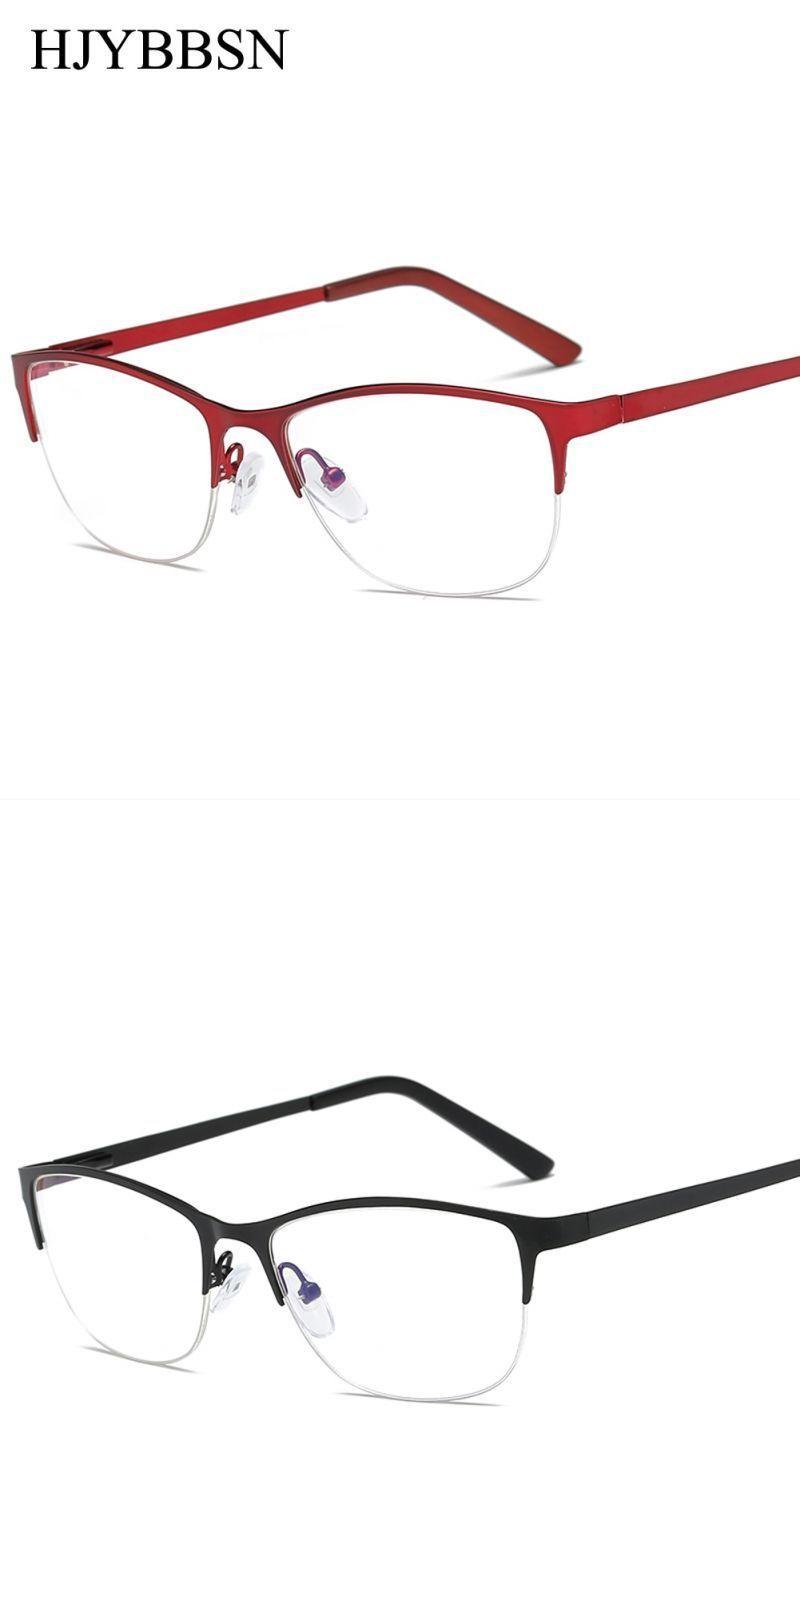 7c3b554ea36 Women metal cat eye glasses frame brand designer fashion men clear lens  eyeglasses eyewear glasses frame for women  copper  women  geometric   eyewear ...